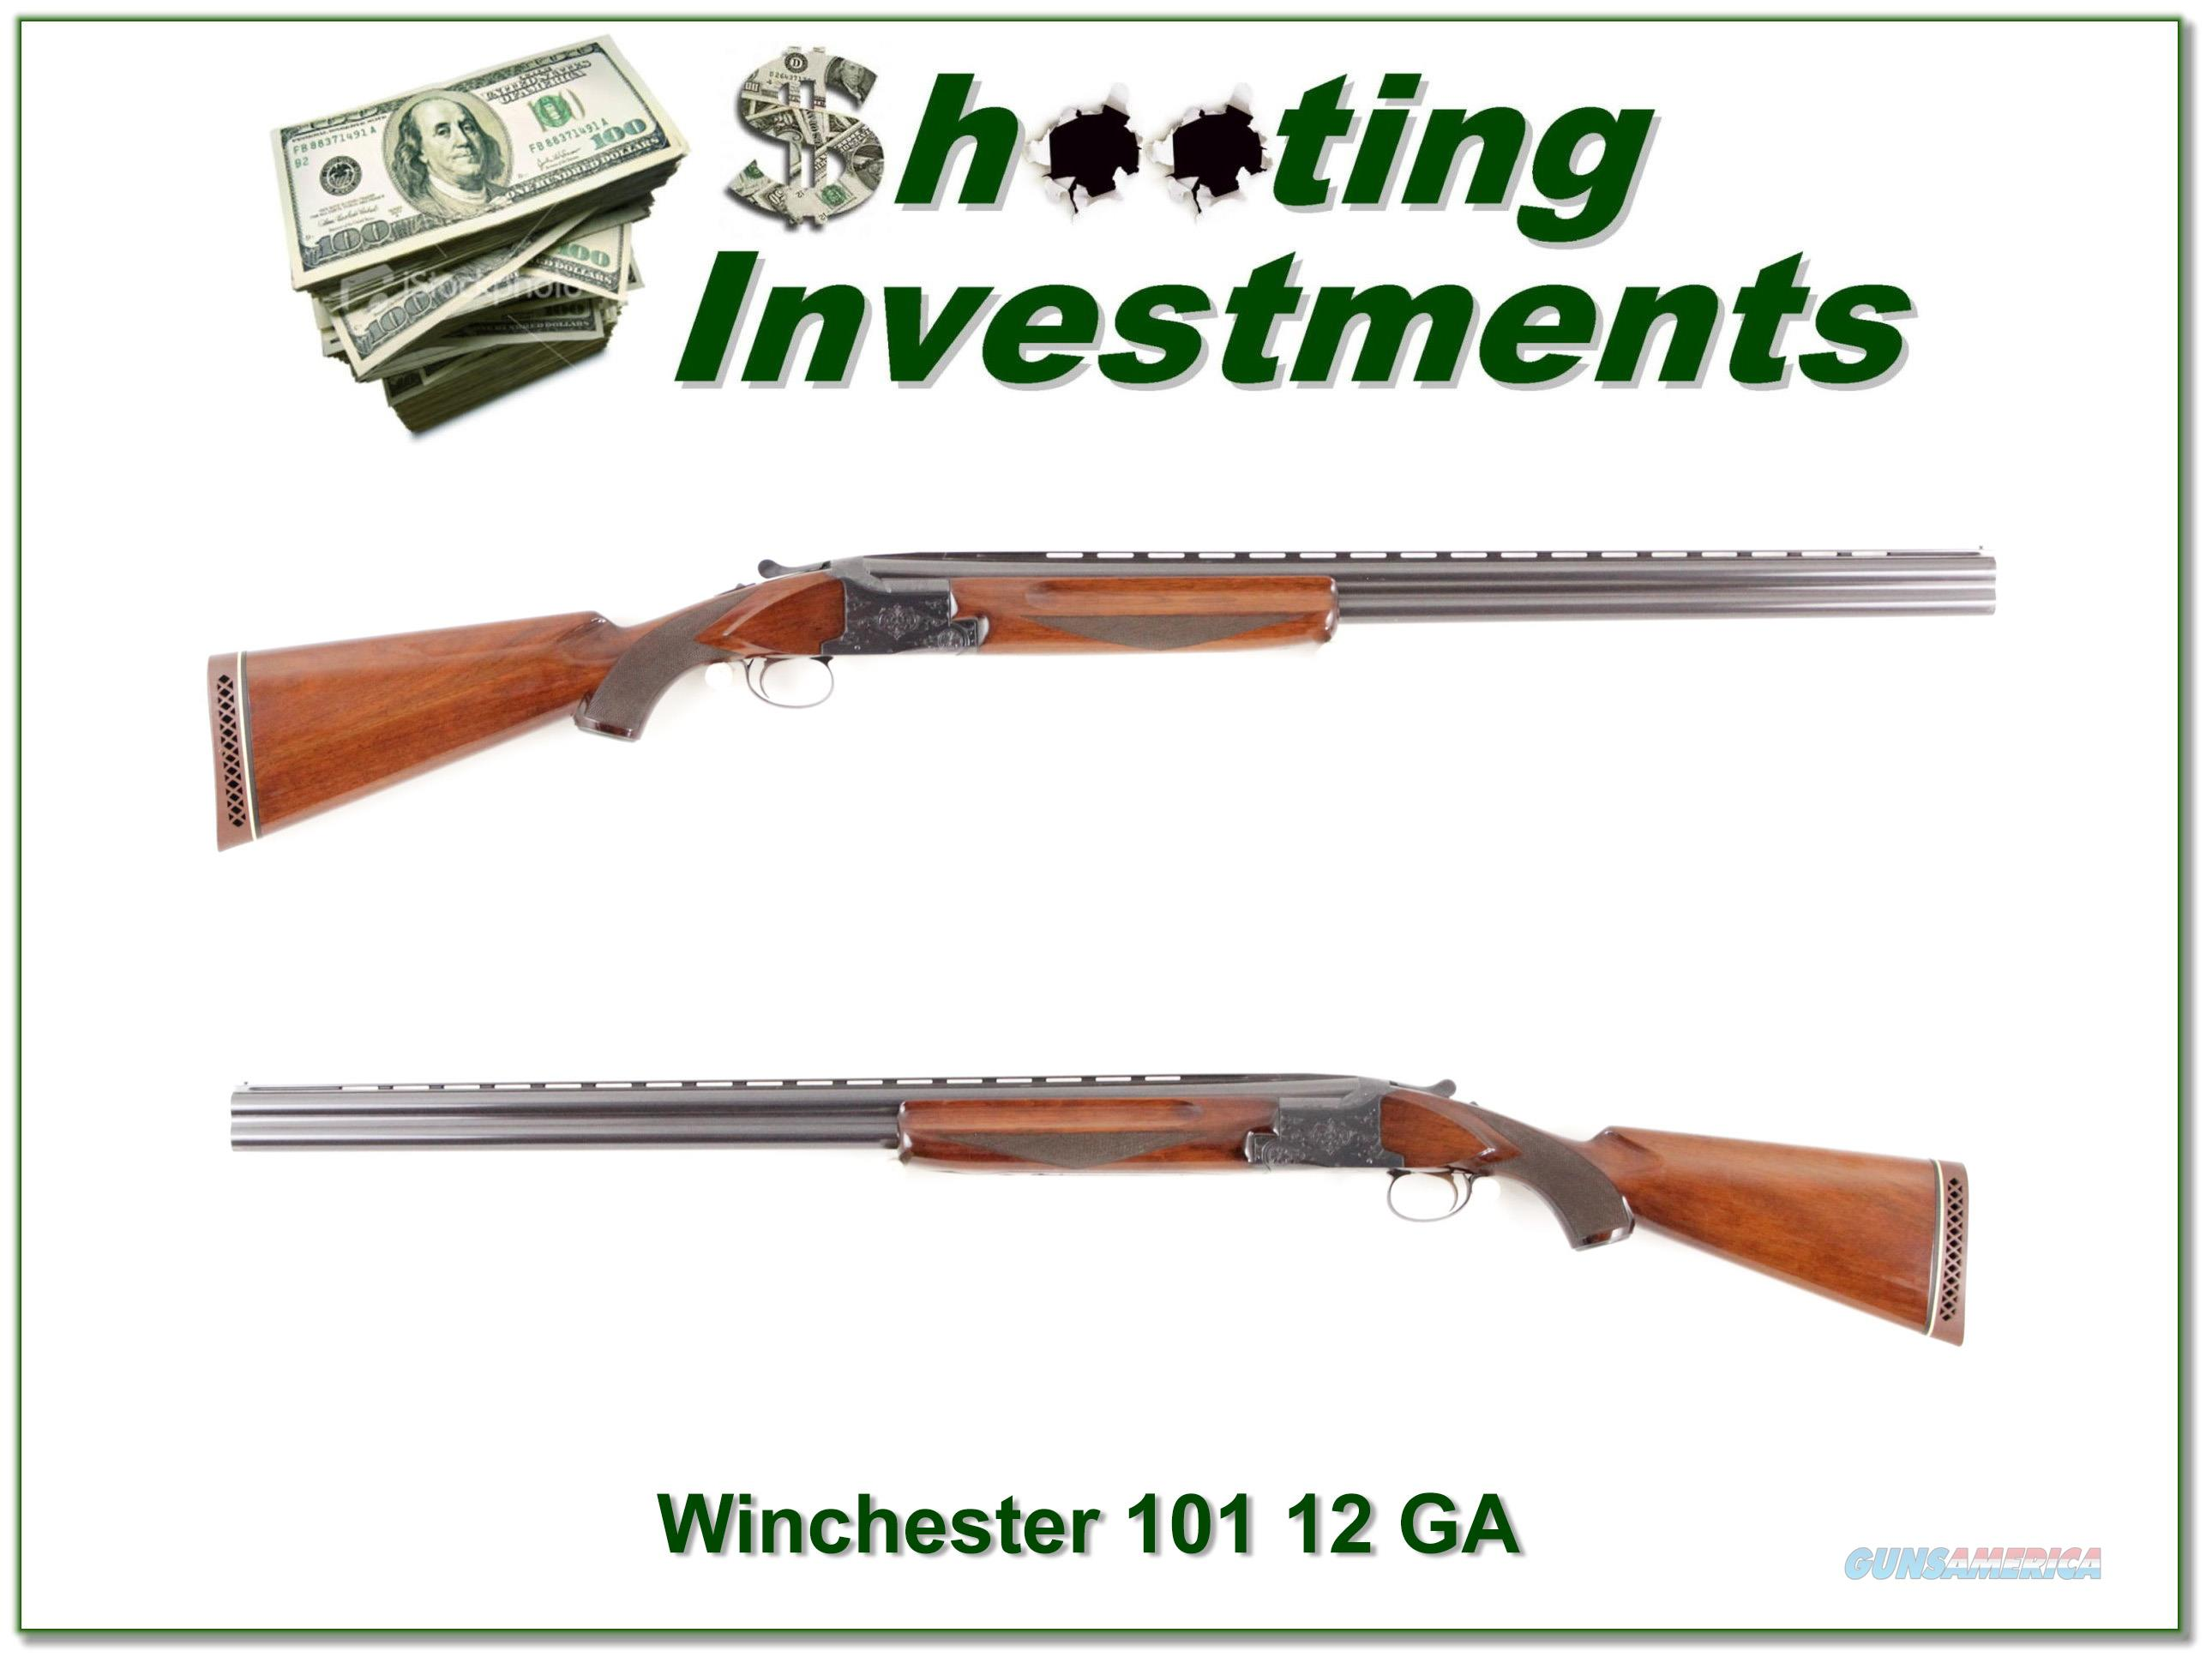 Winchester 101 12 Gauge SxS 30in Exc Cond  Guns > Shotguns > Winchester Shotguns - Modern > O/U > Hunting